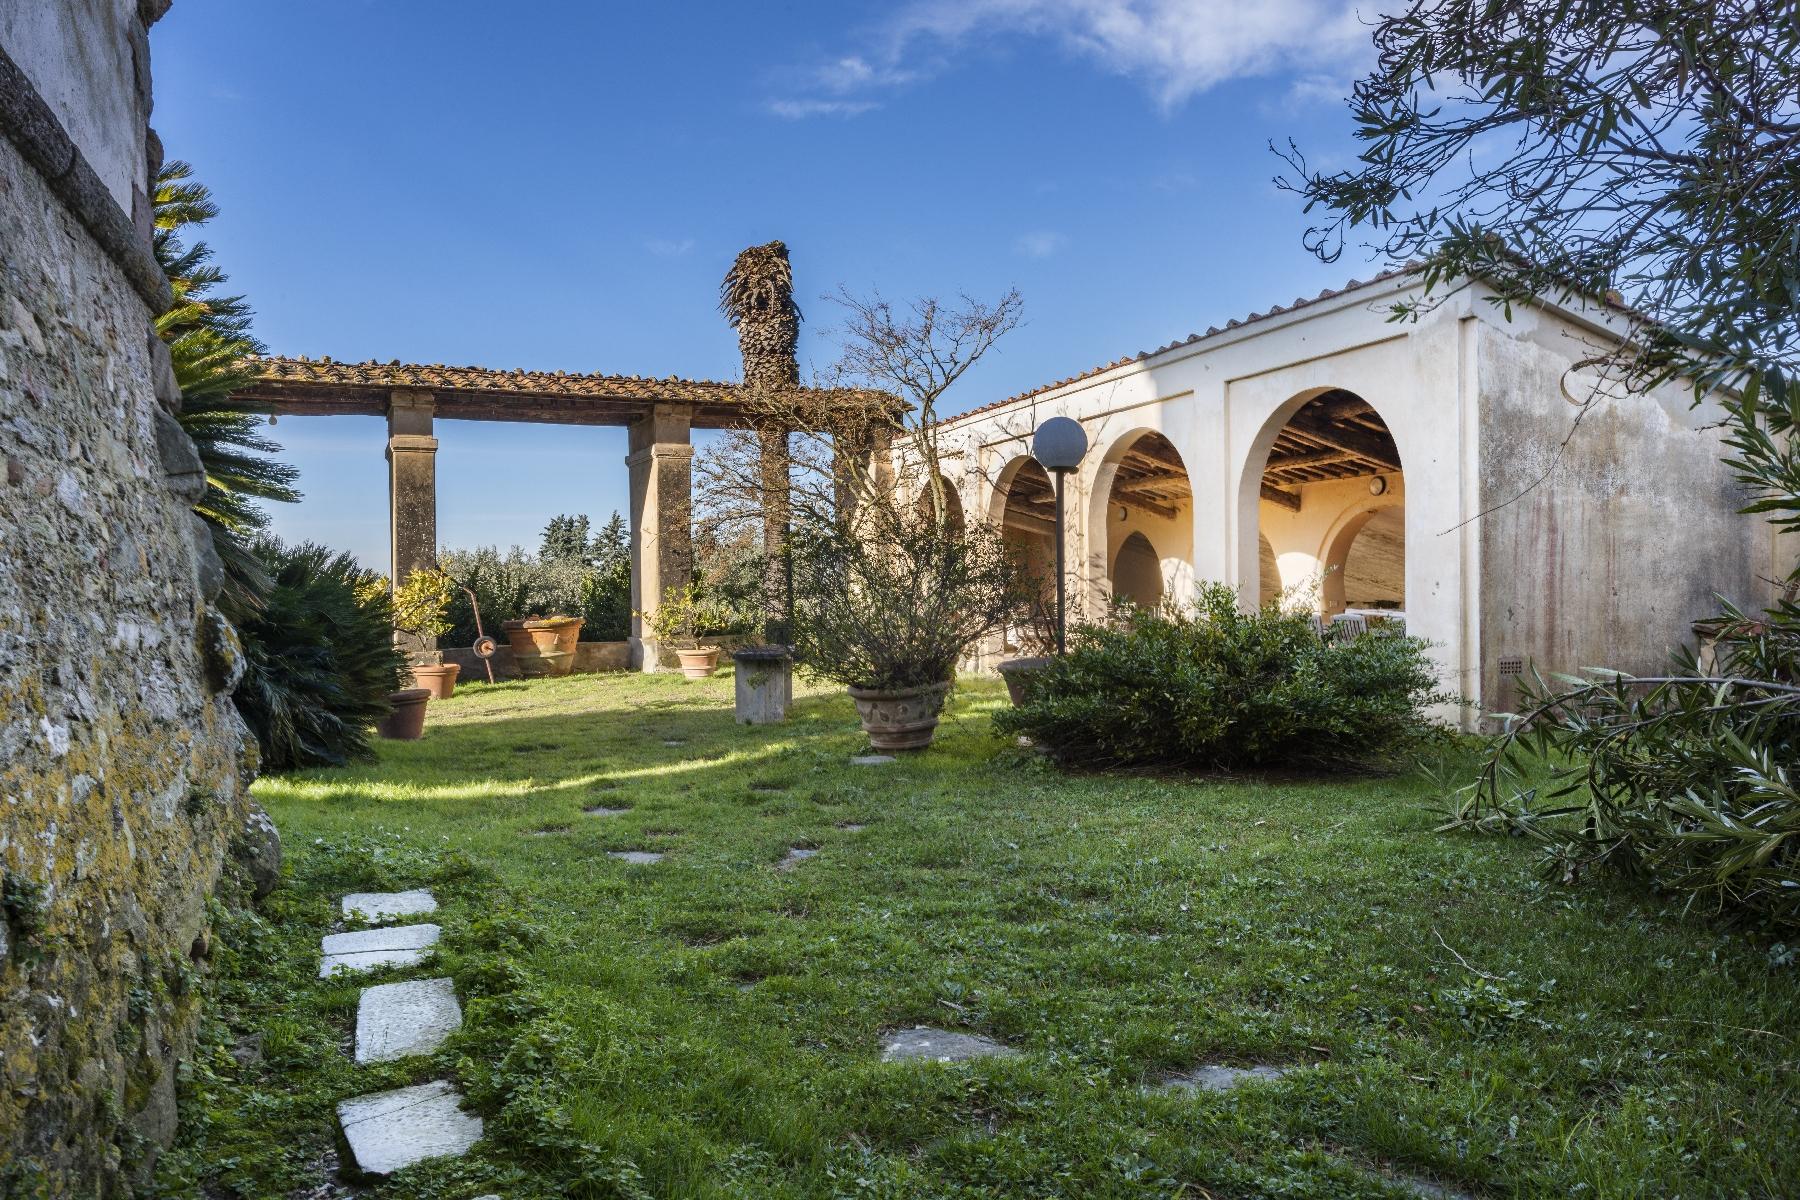 Villa in Vendita a Camaiore: 5 locali, 2800 mq - Foto 24